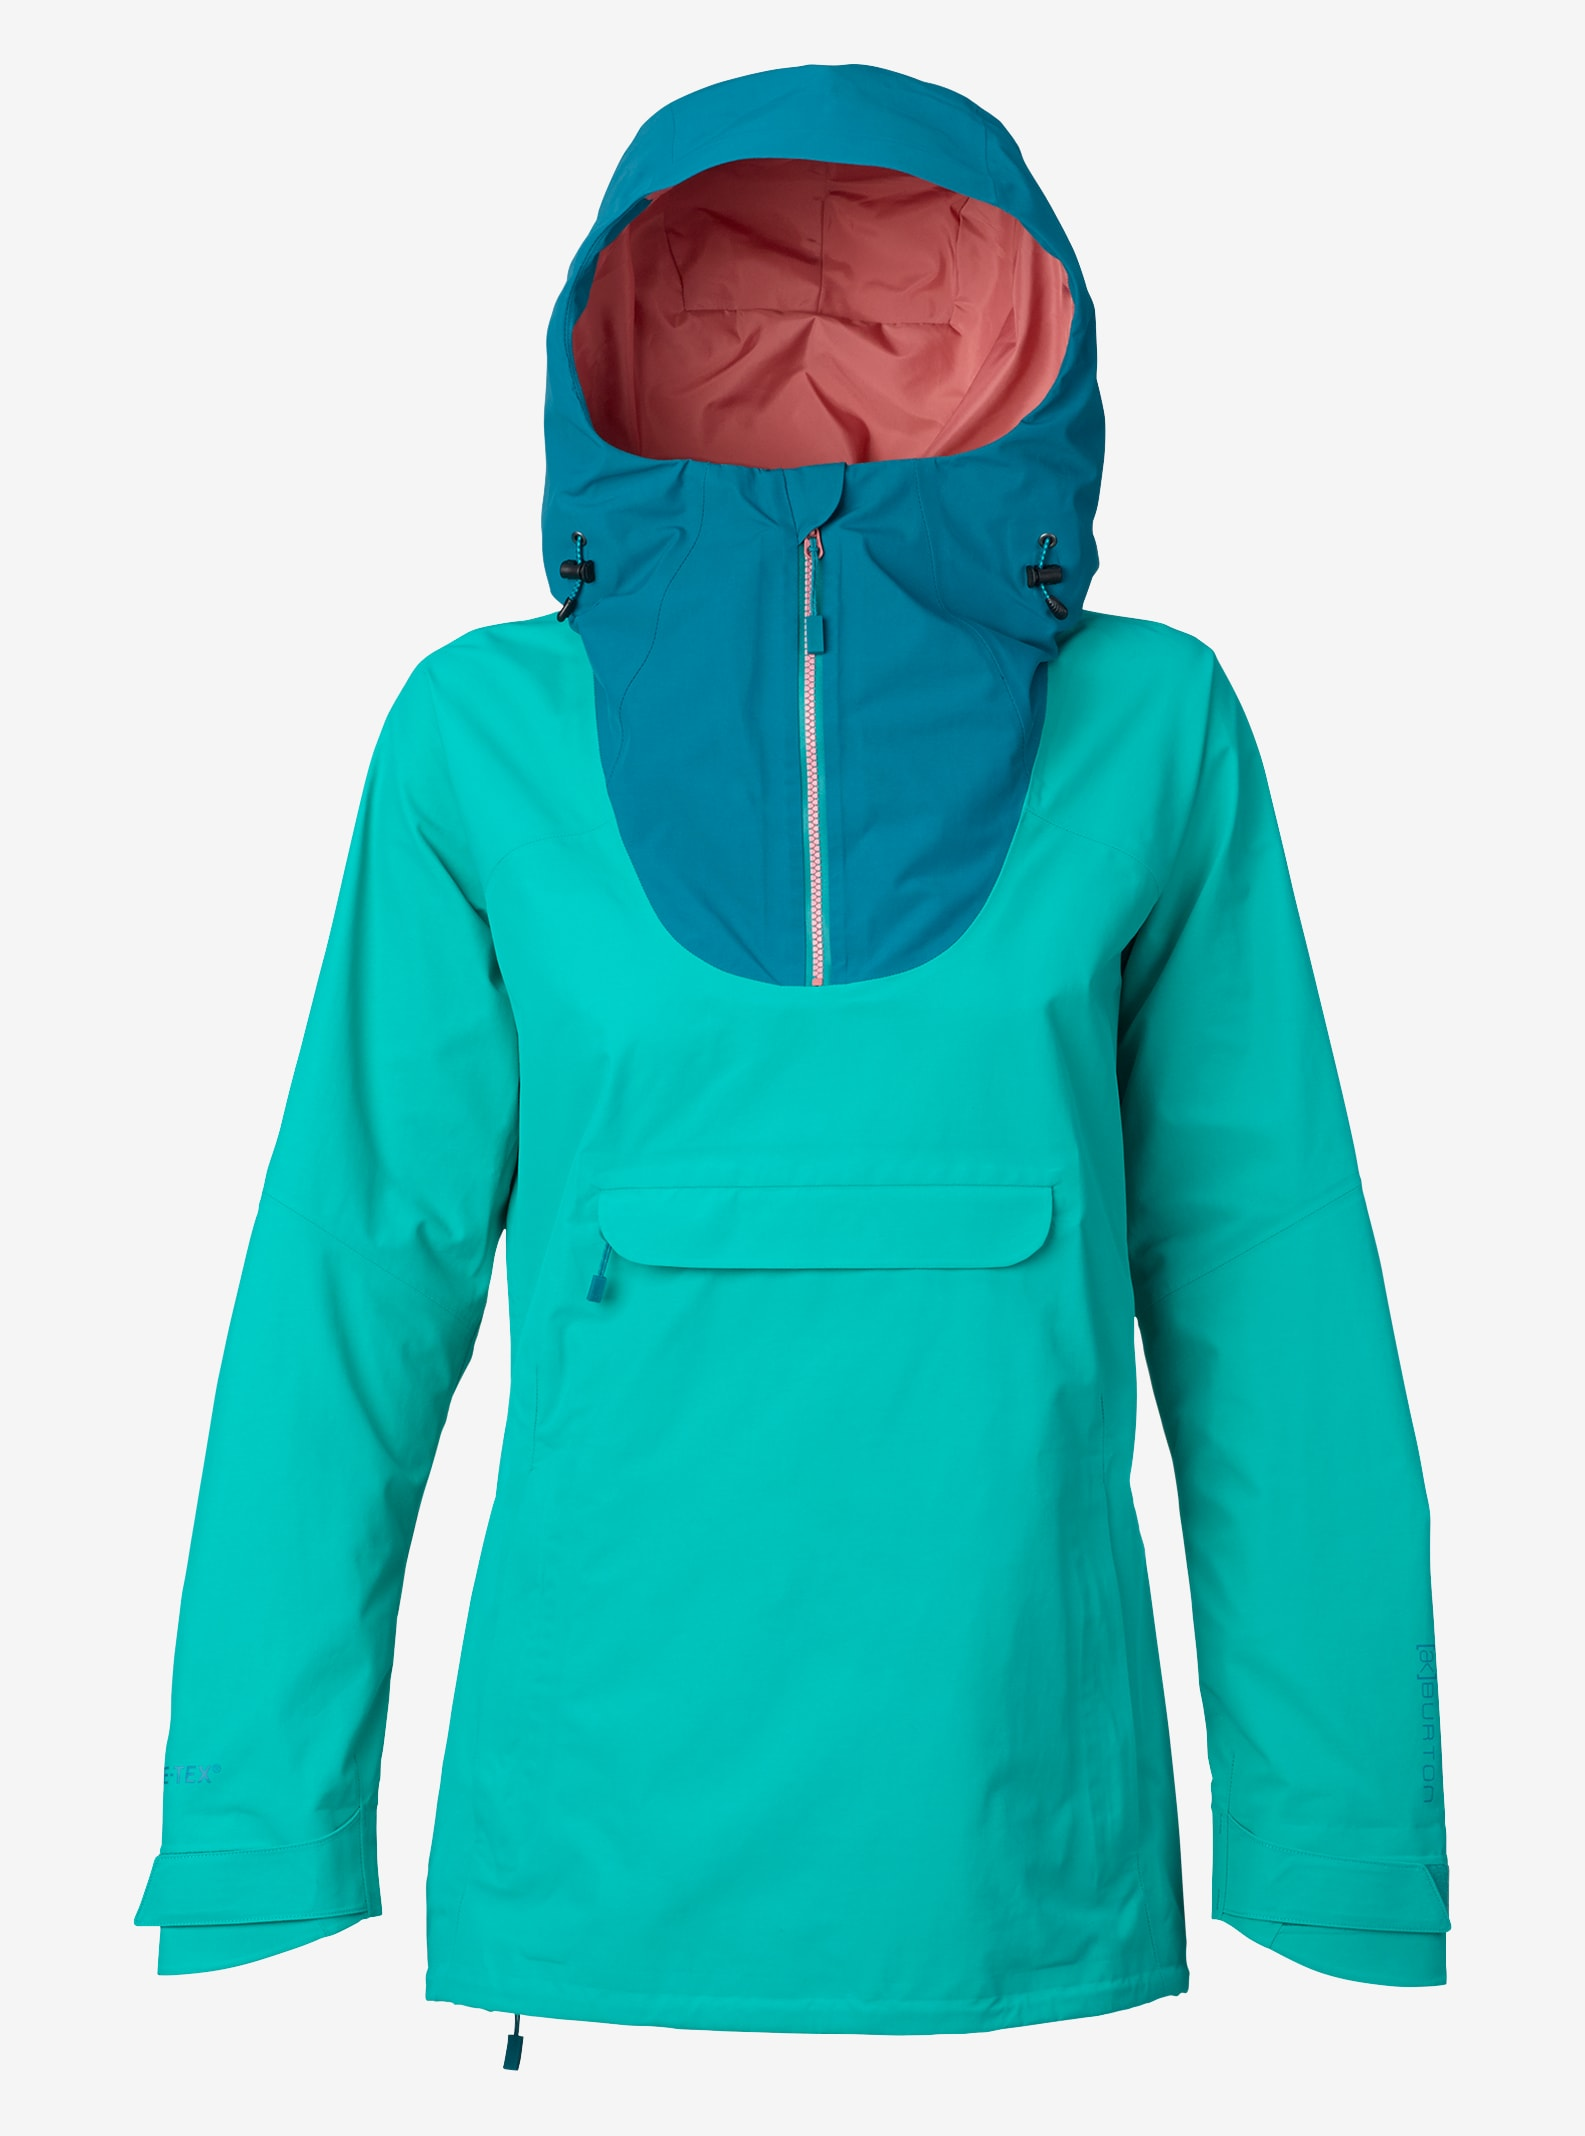 Women's Burton [ak] GORE‑TEX® 2L Elevation Anorak Jacket shown in Spectra / Harbor